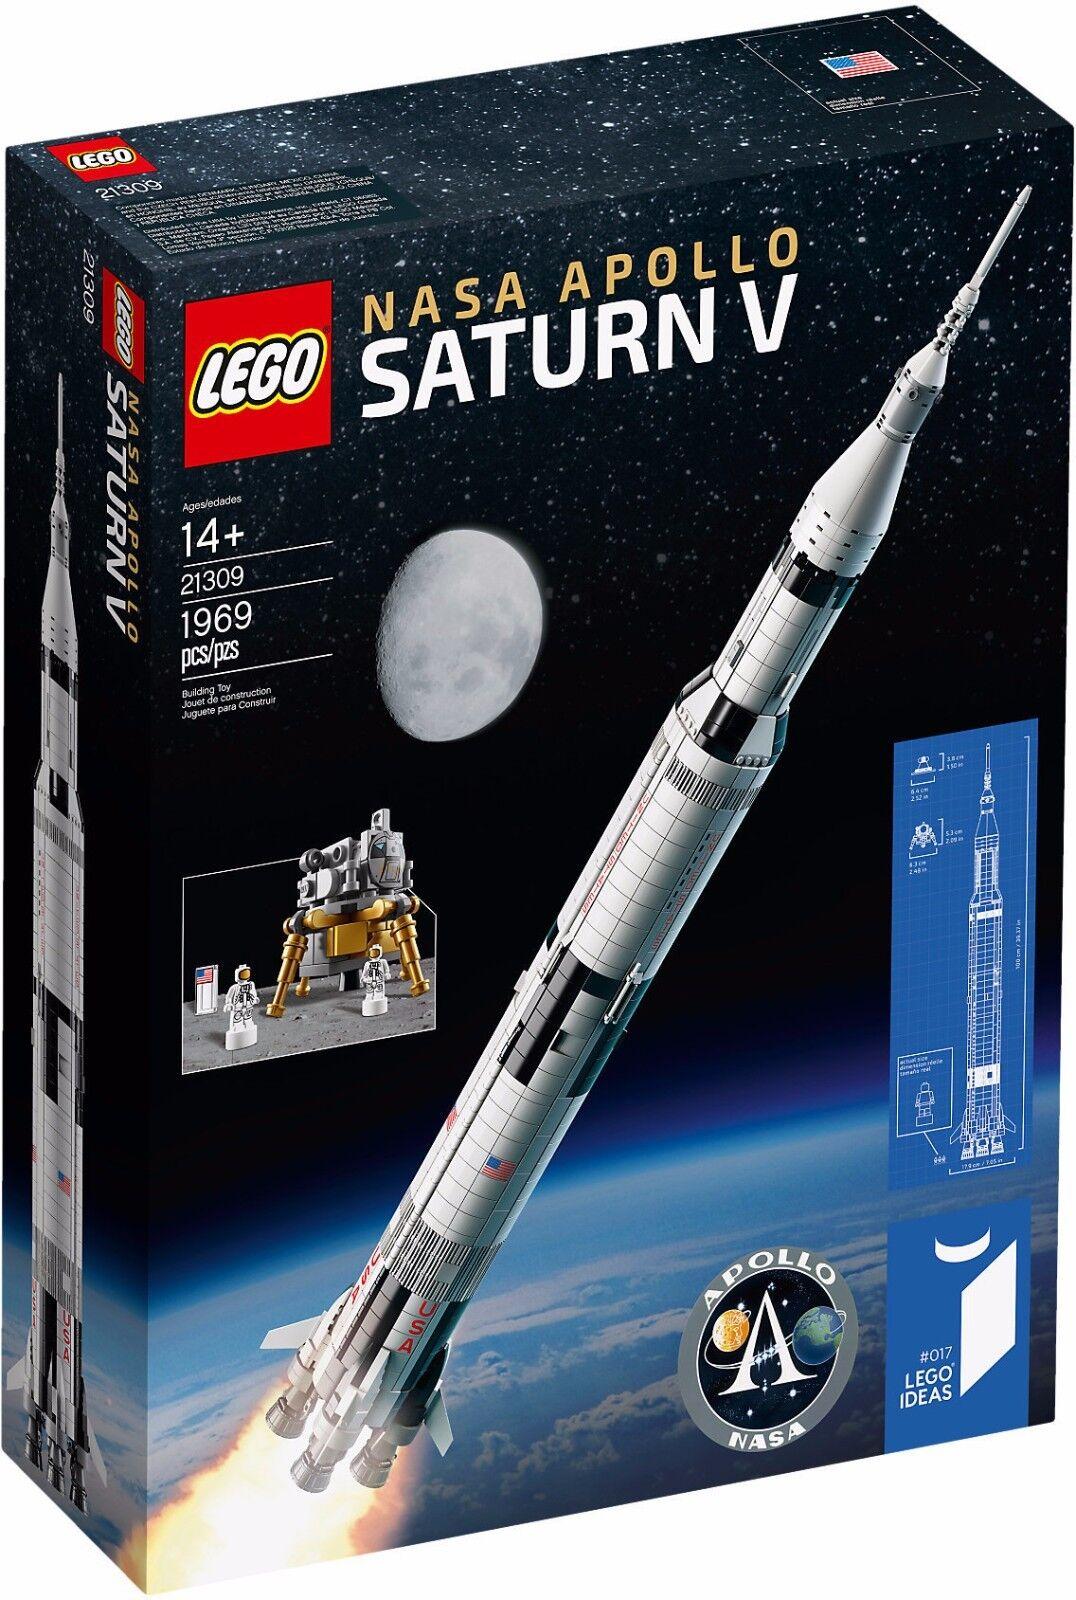 LEGO IDEAS 21309 21309 21309 SATURN V APOLLO NASA NUOVO NEW 736018